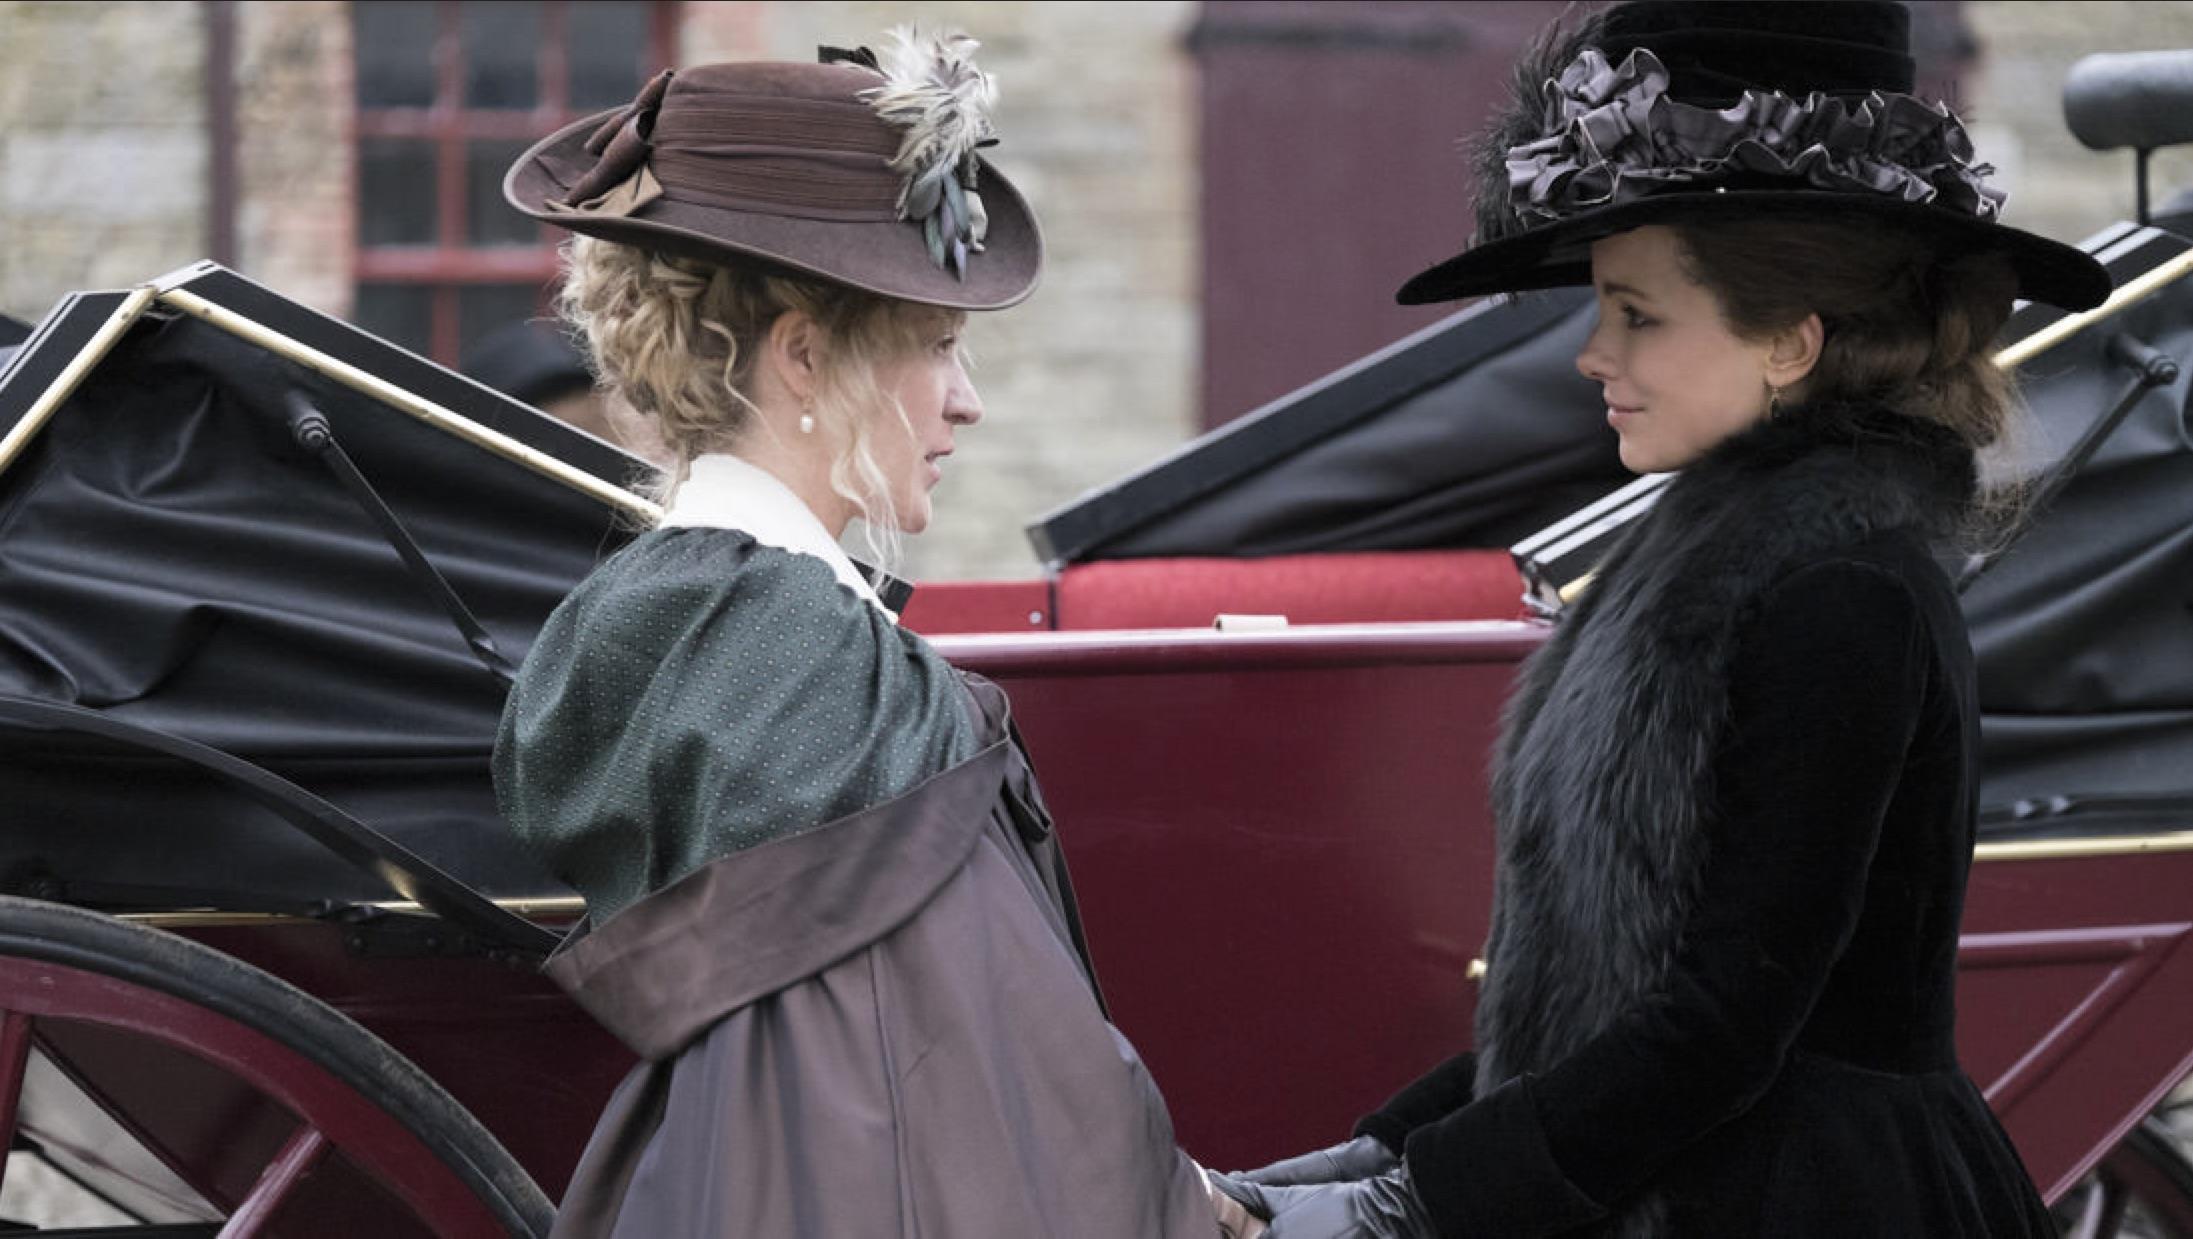 Kate Beckinsale Chloe Sevigny Jane Austen Whit Stillman